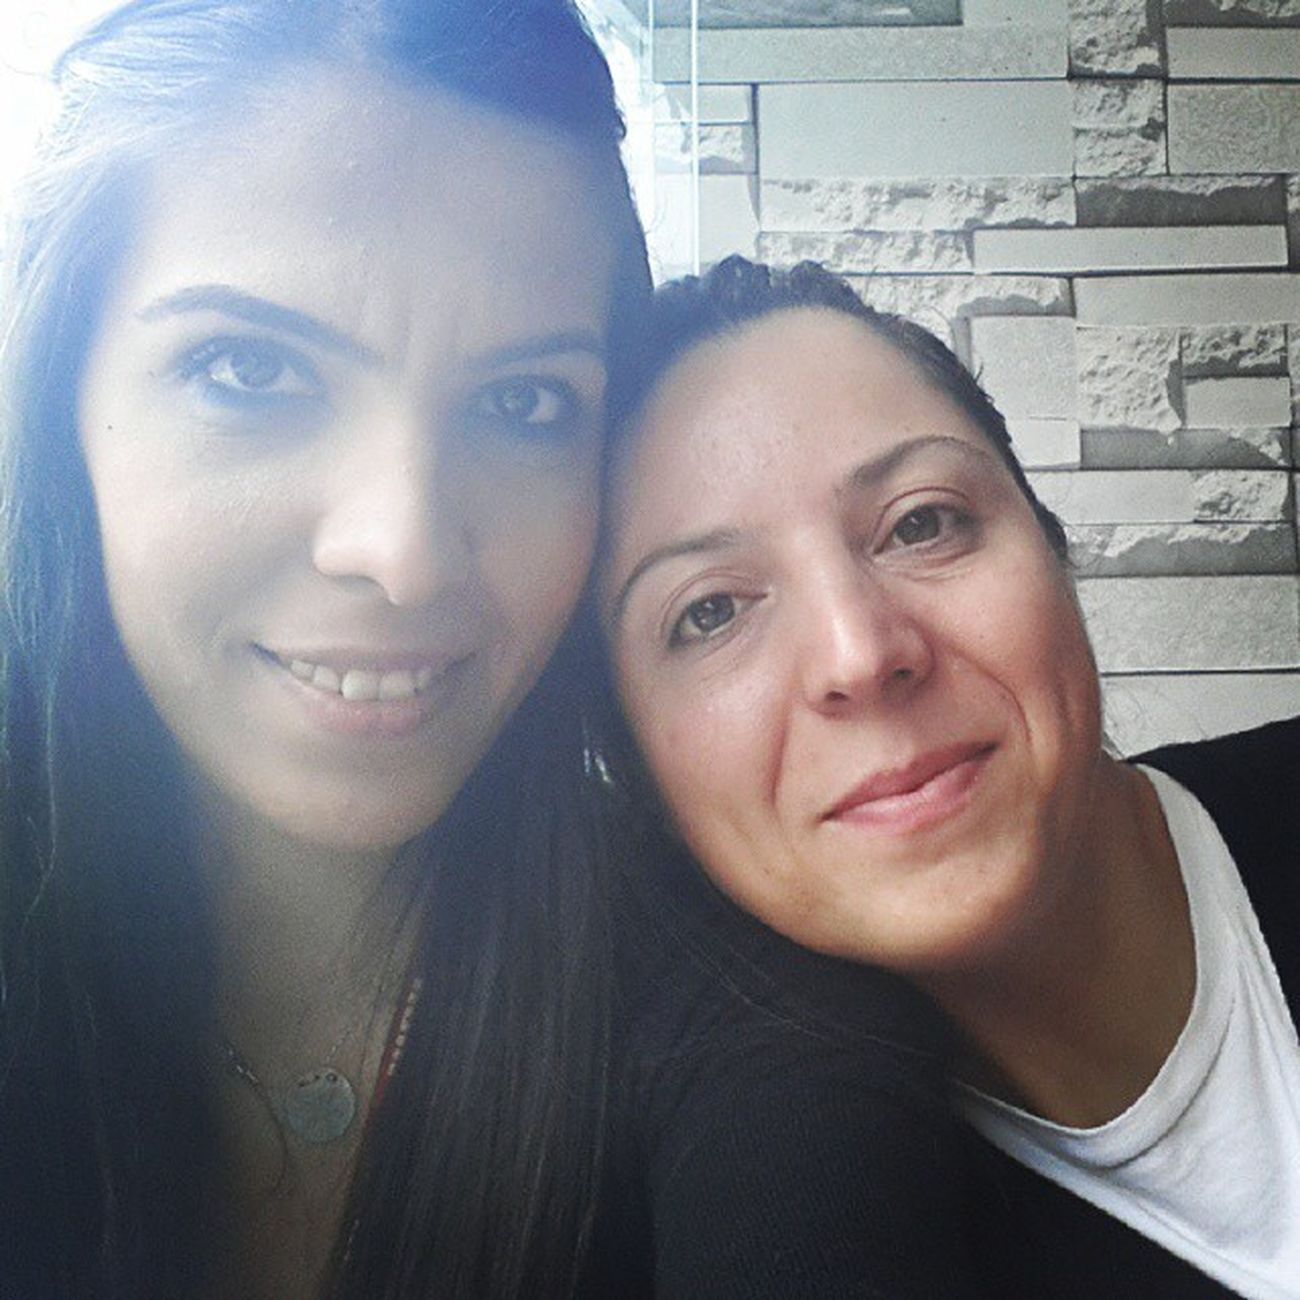 Öğle molasiiiii :) Berrak Me We Fatma komtekstilmissclairearkadaş dost friend arkadas kızılayykm ykmkızılay